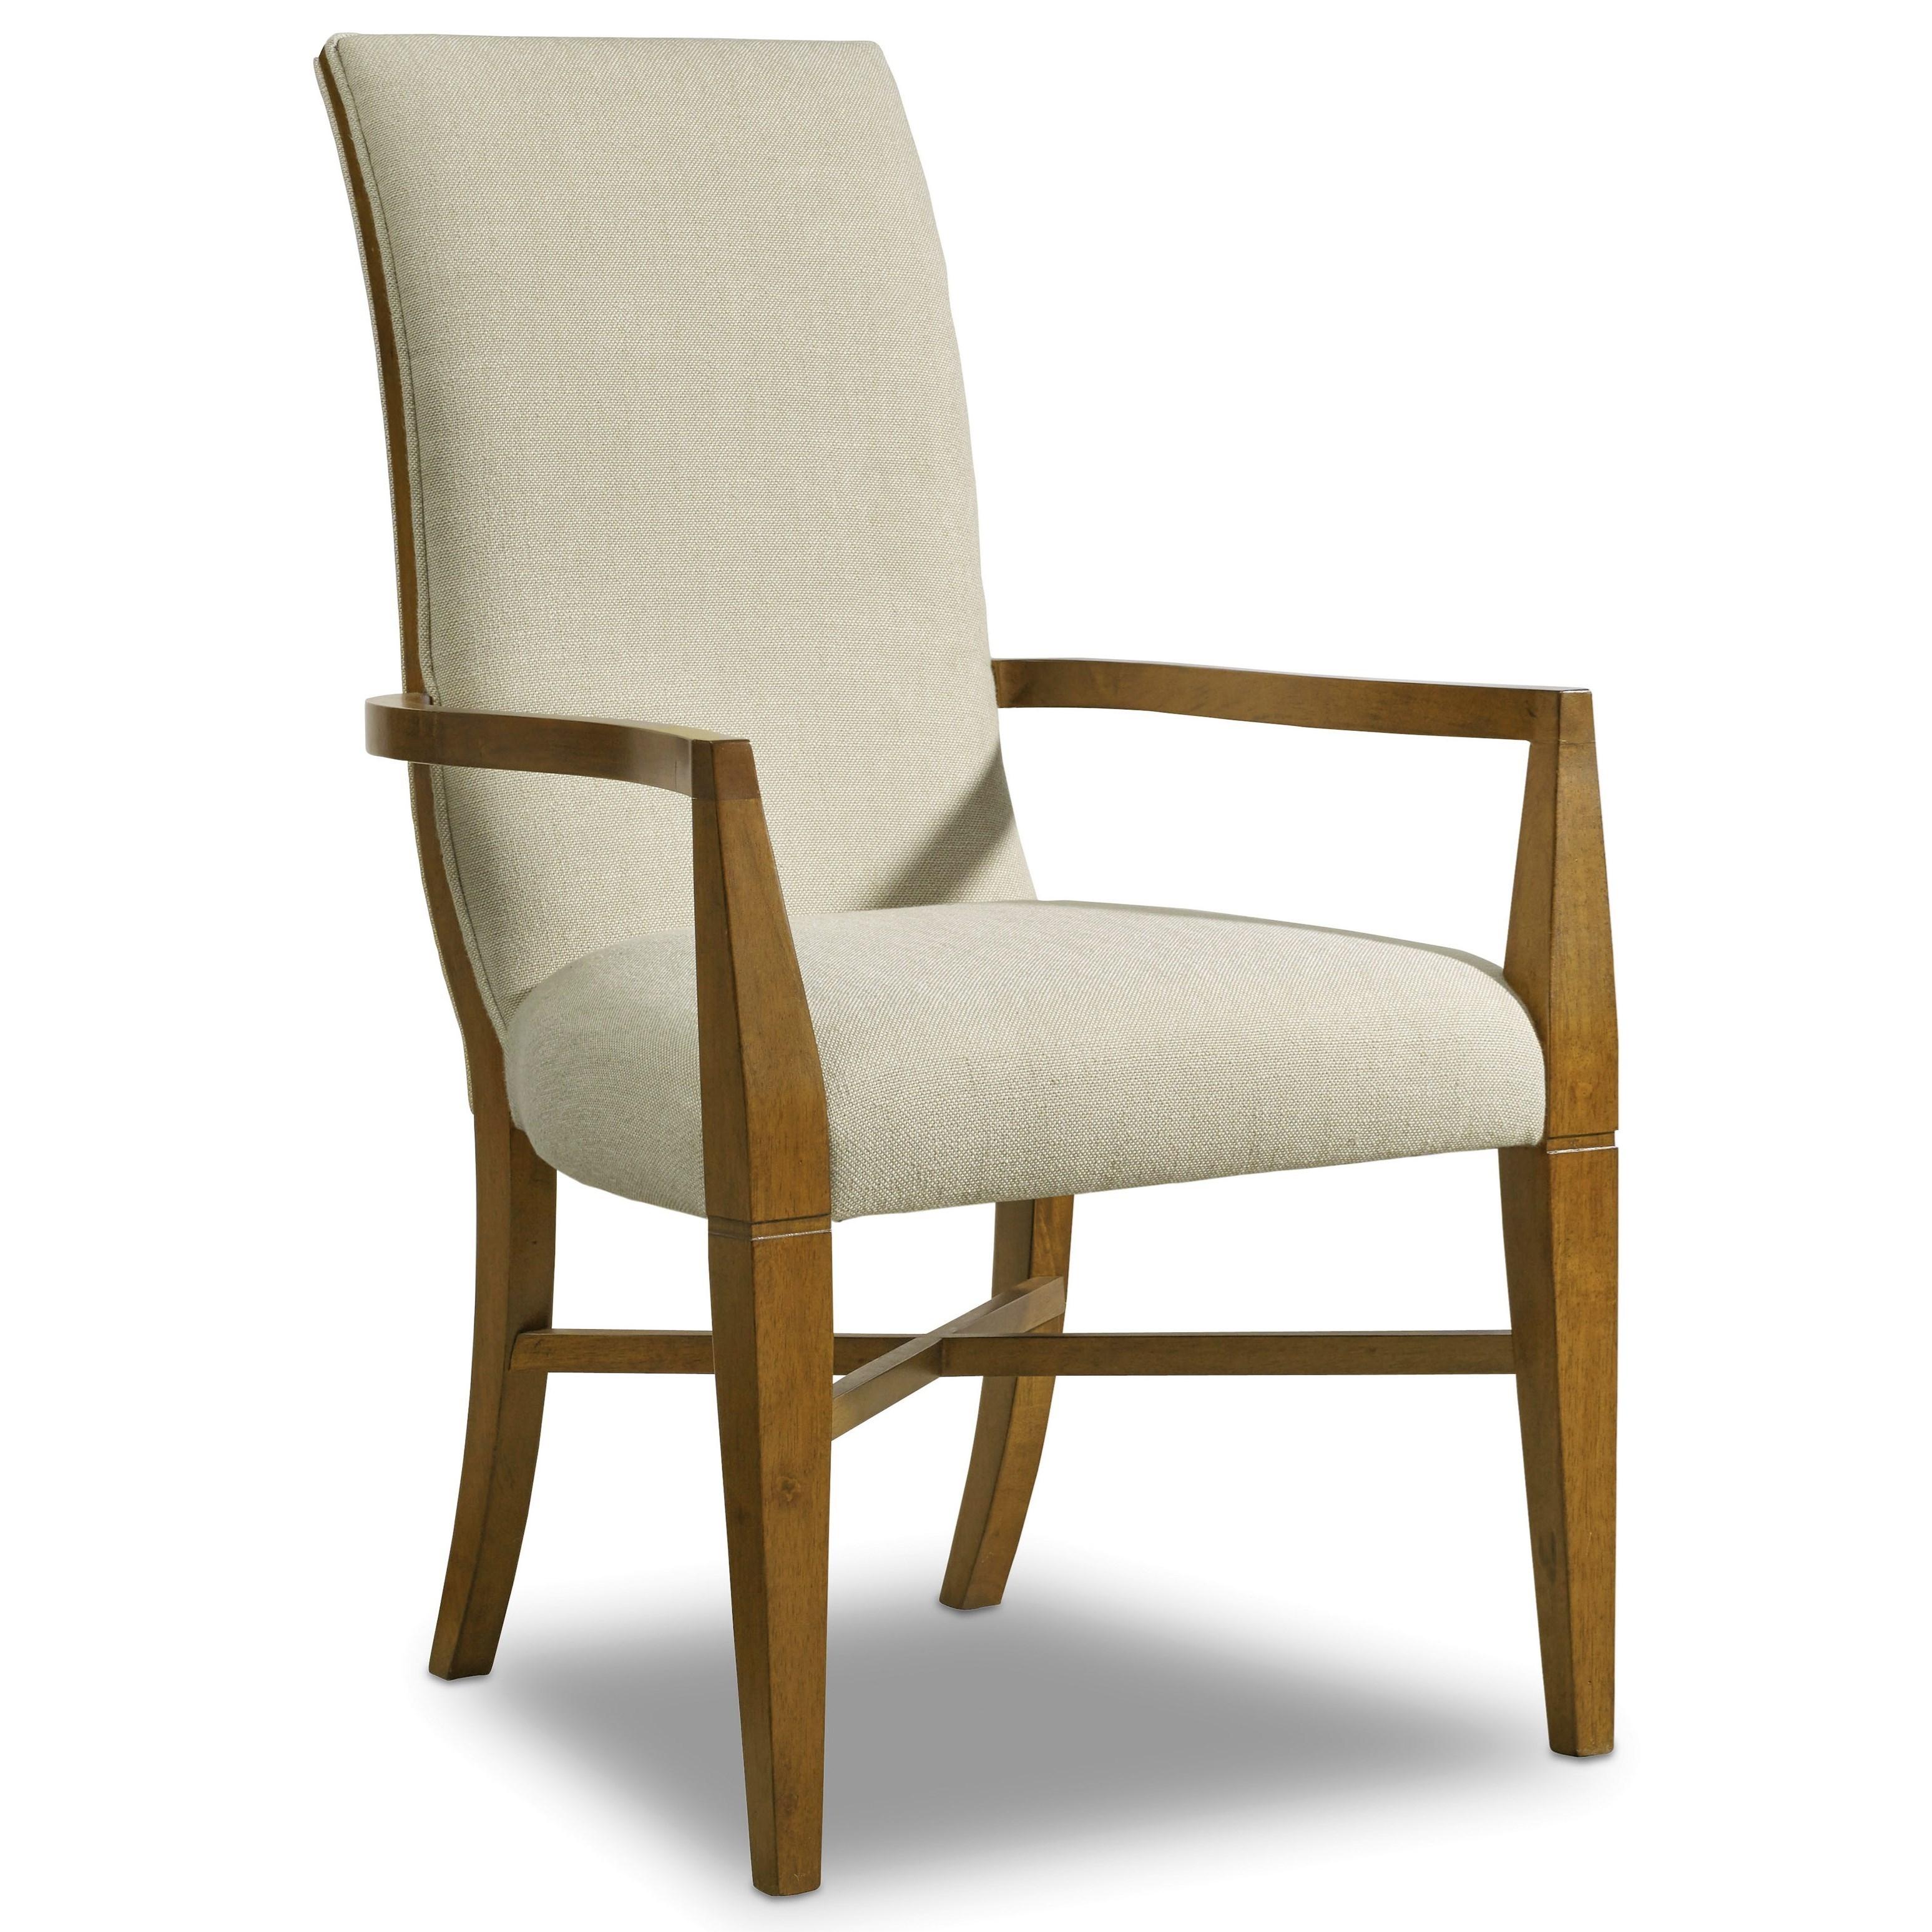 Hooker Furniture Retropolitan Upholstered Arm Chair - Item Number: 5510-75500-MWD